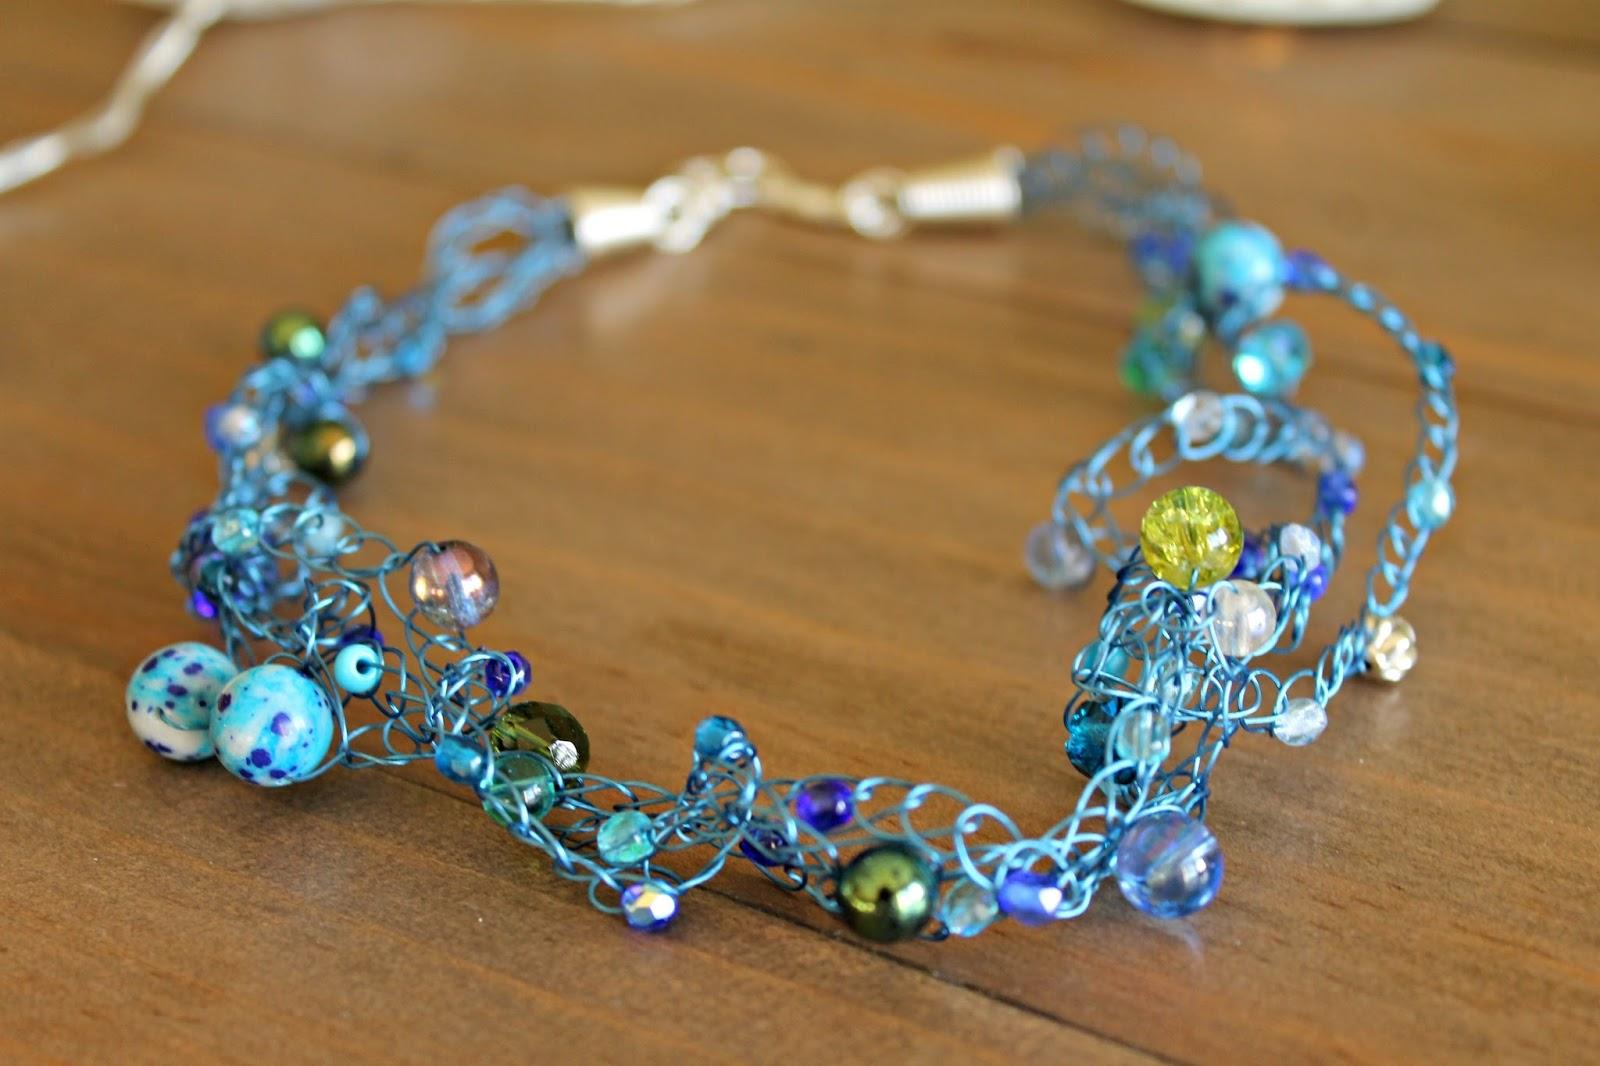 Terramor jewellery blog review